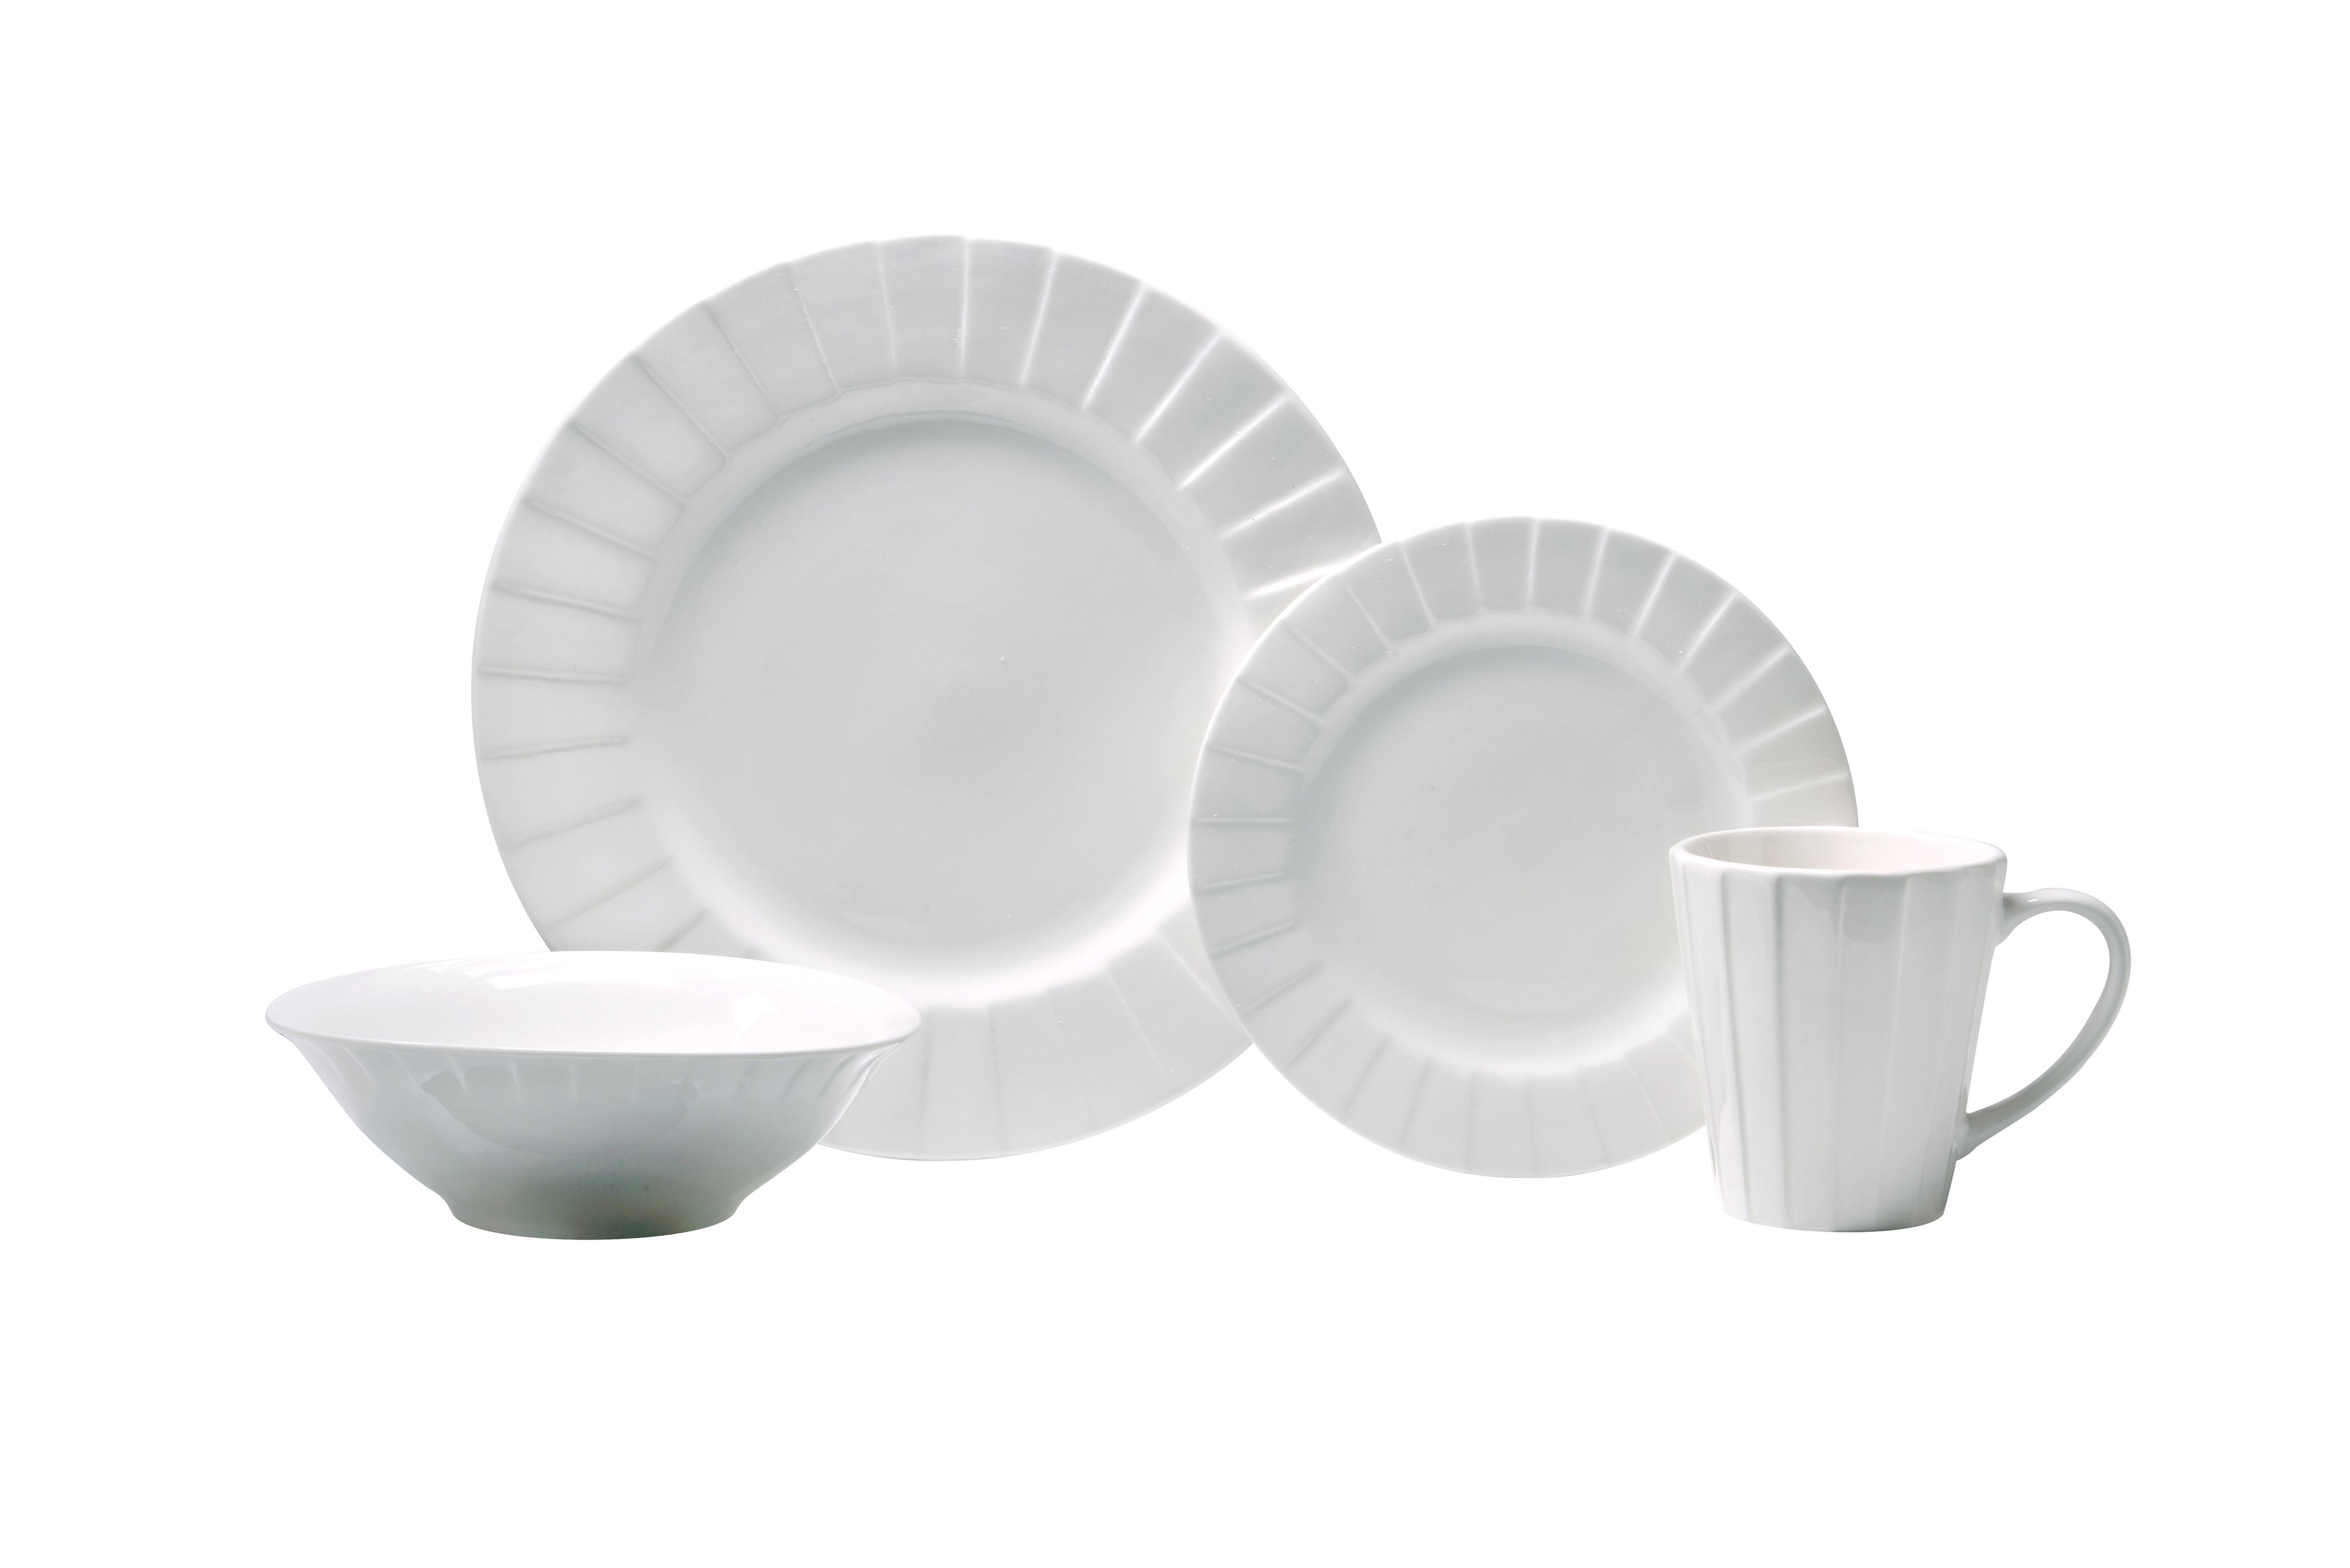 Ori dinnerware  sc 1 st  Kitchenware News & Oneida Dinnerware Caught In All-White after Labor Day   Kitchenware ...